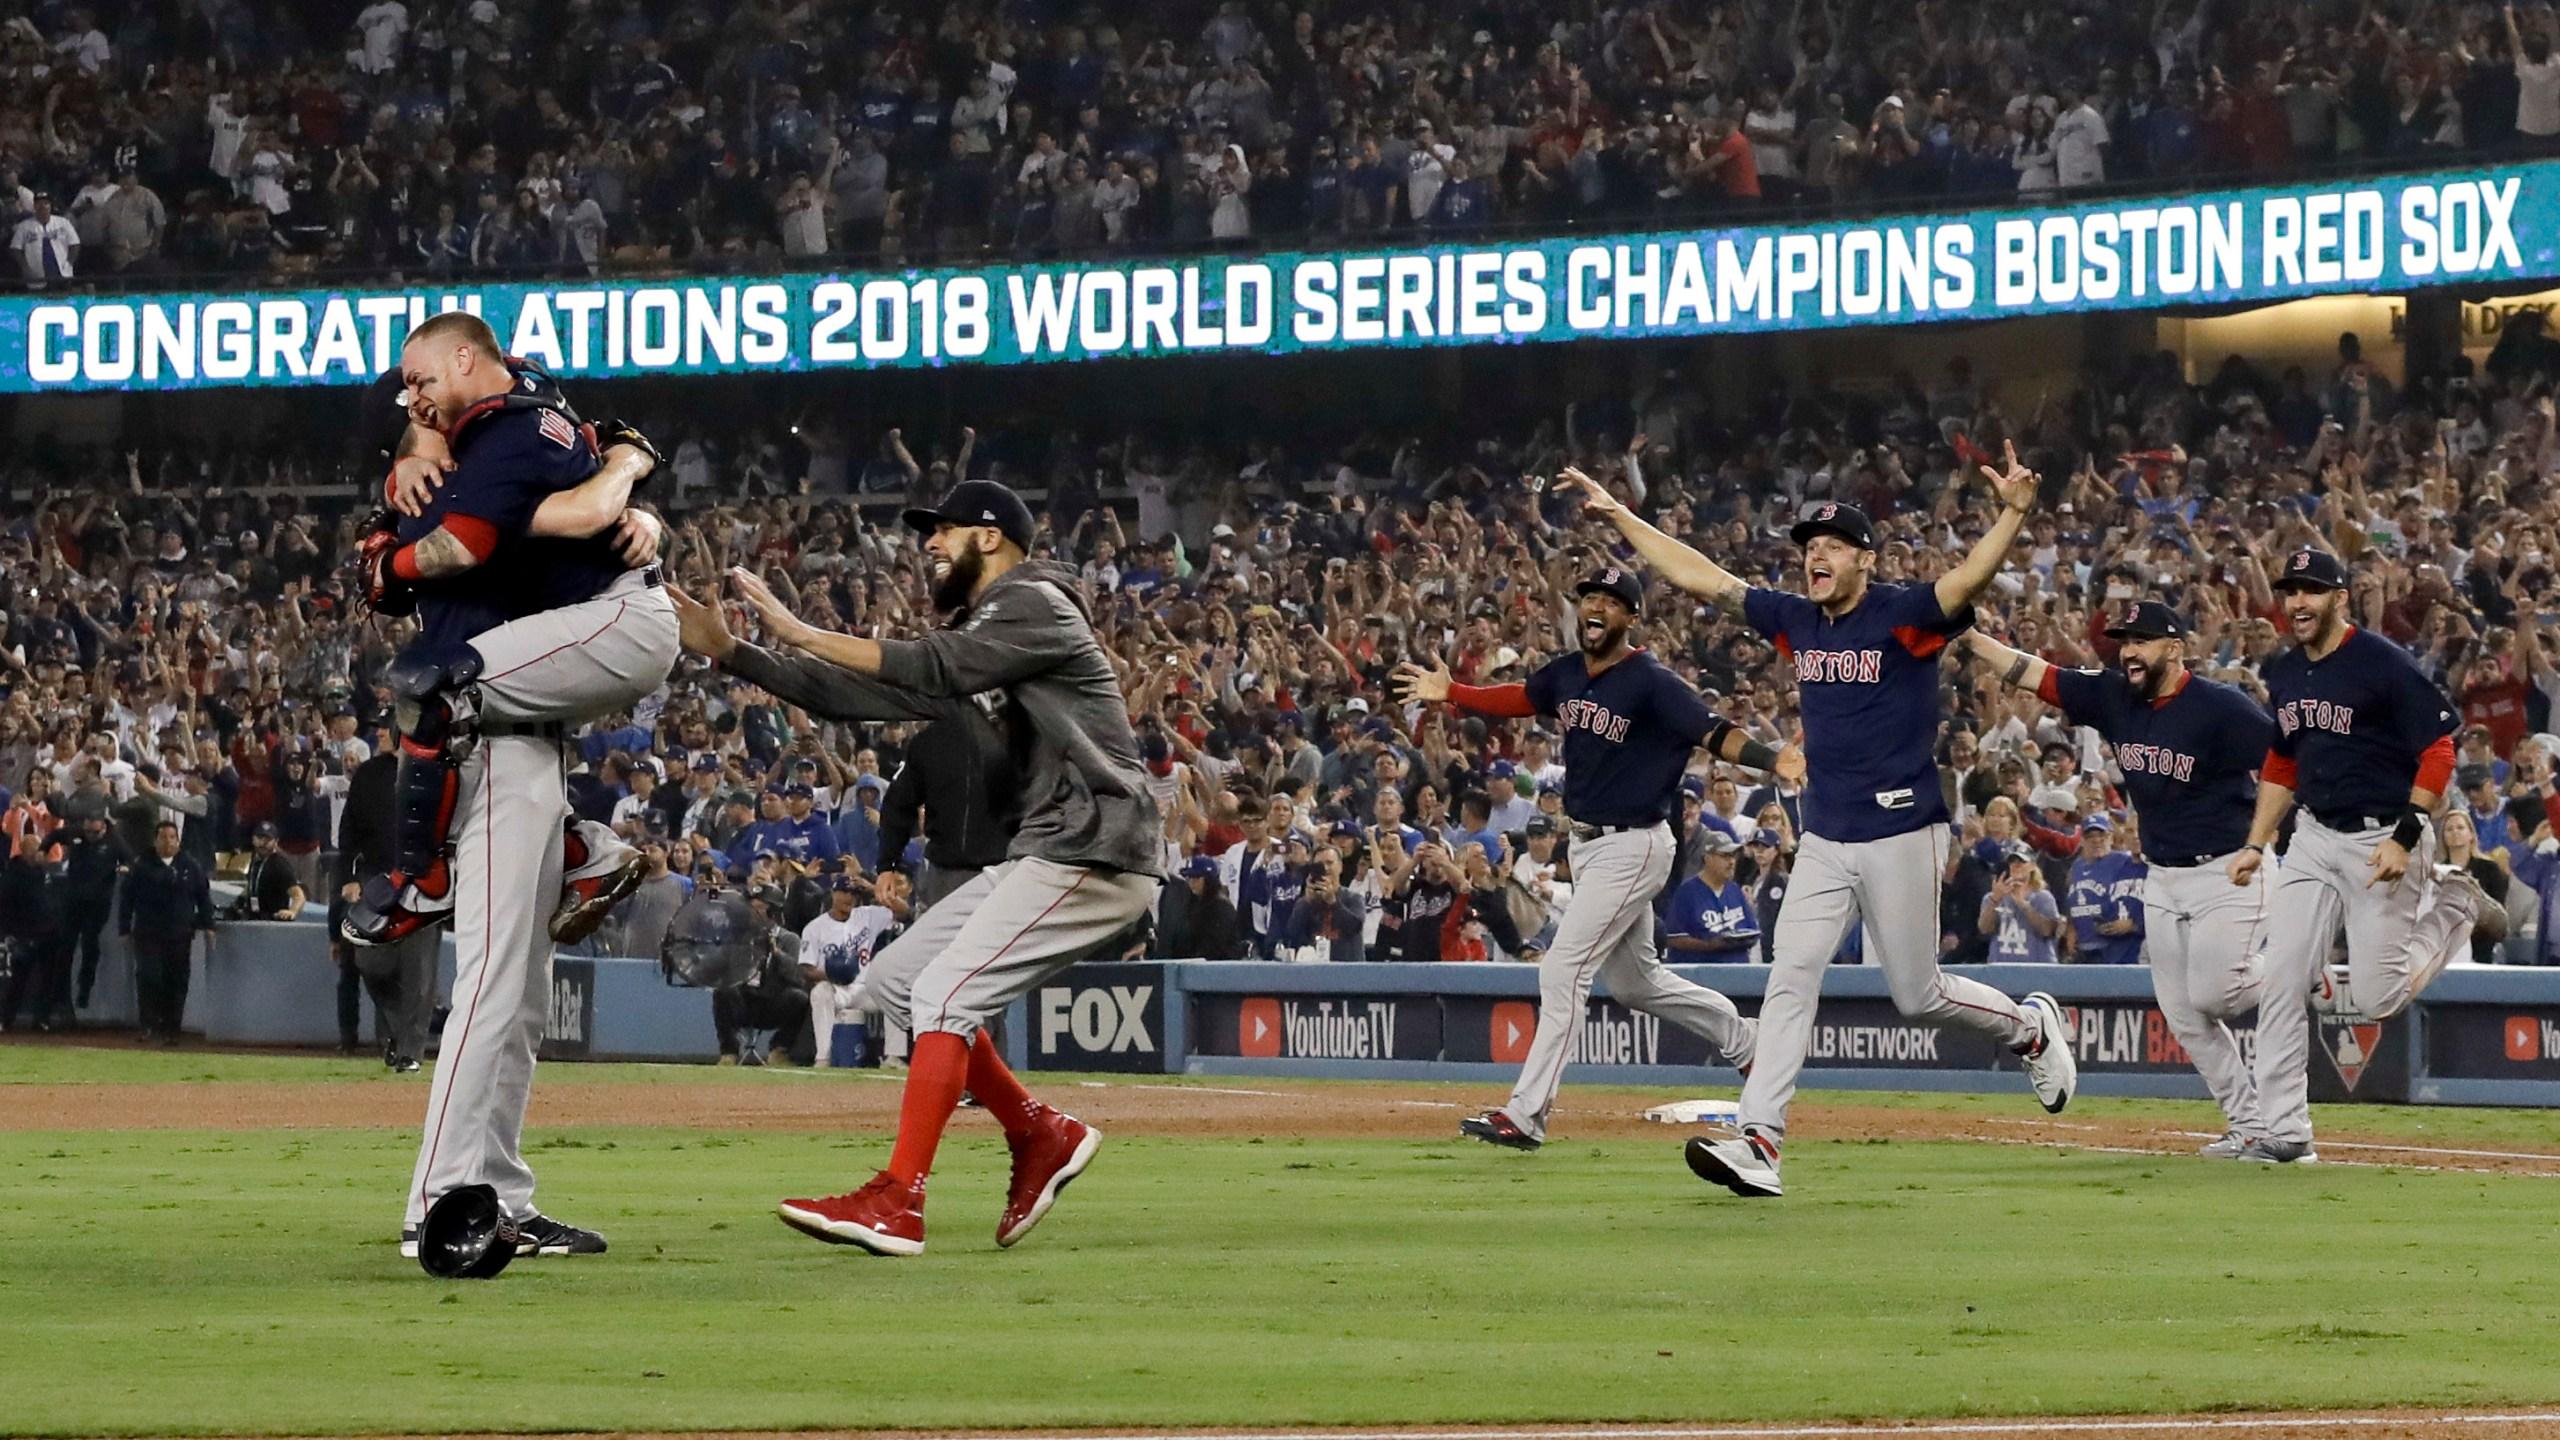 APTOPIX_World_Series_Red_Sox_Dodgers_Baseball_63751-159532.jpg28582012